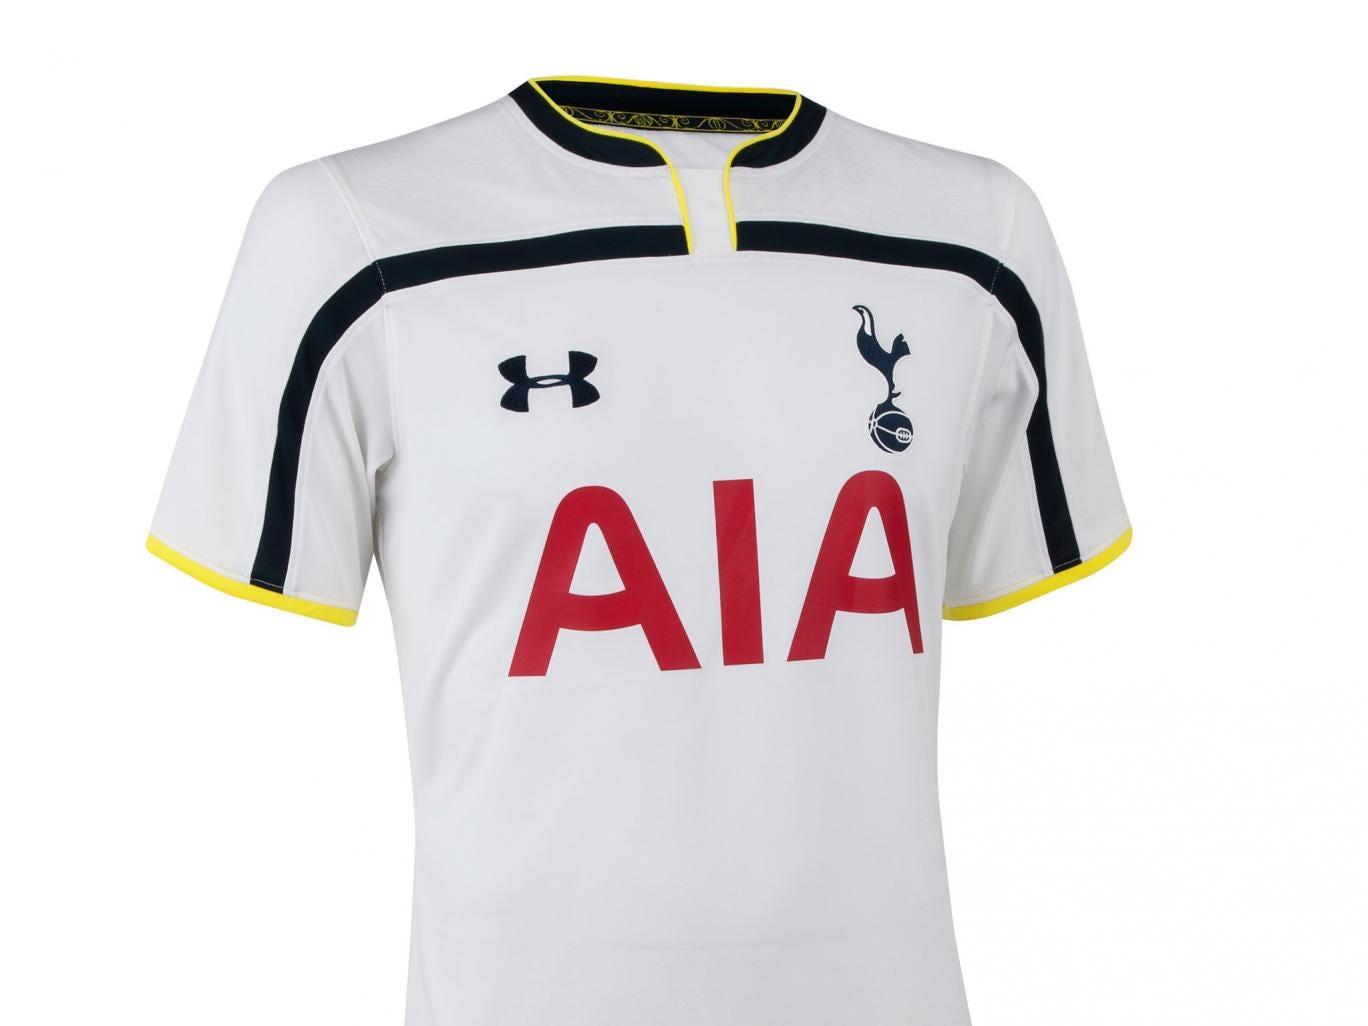 The new Tottenham Hotspur home shirt